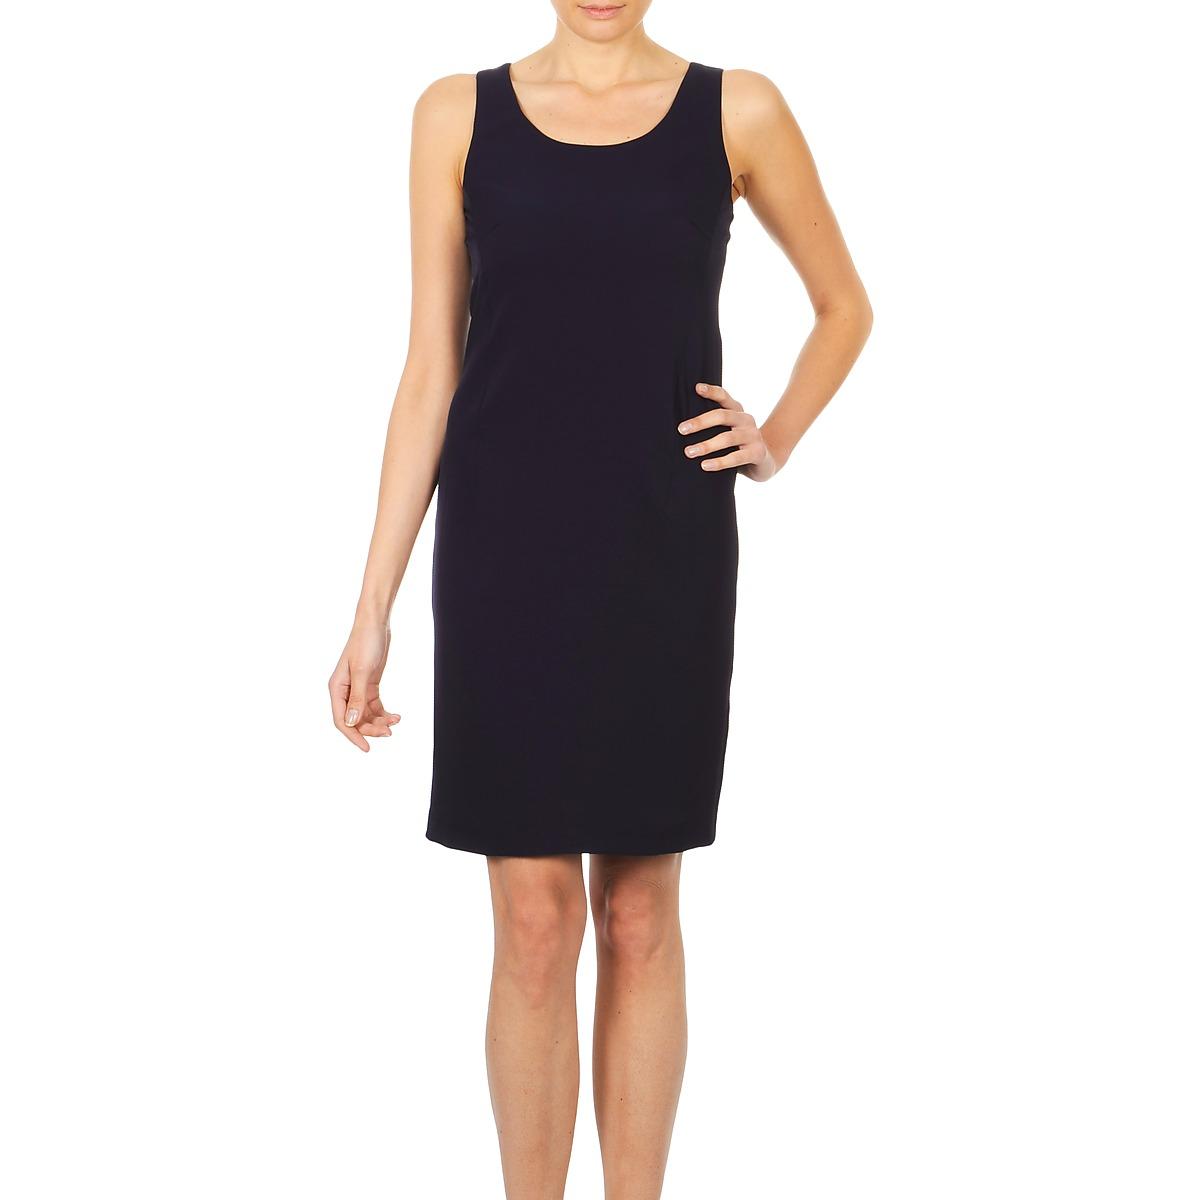 9acbafa89cb3 Κοντά Φορέματα Lola RABANNE SOFT Σύνθεση  Πολυεστέρας   Σύνθεση ...